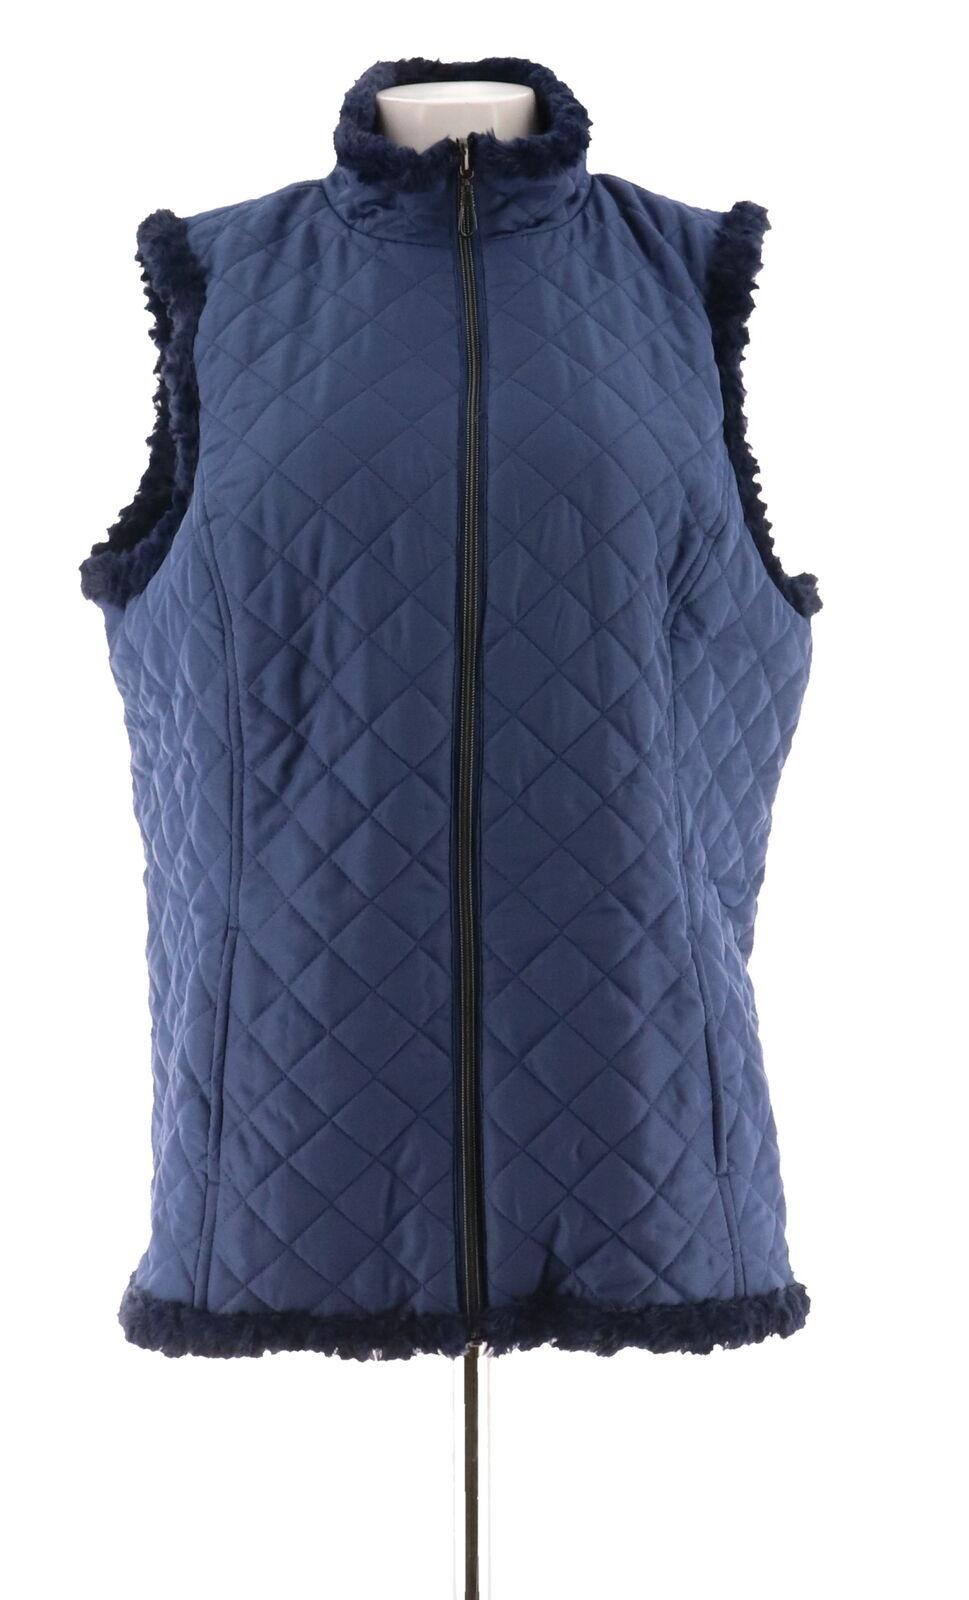 Denim & Co Reversible Zip Front Textured Quilted Vest Dark Indigo M NEW A282681